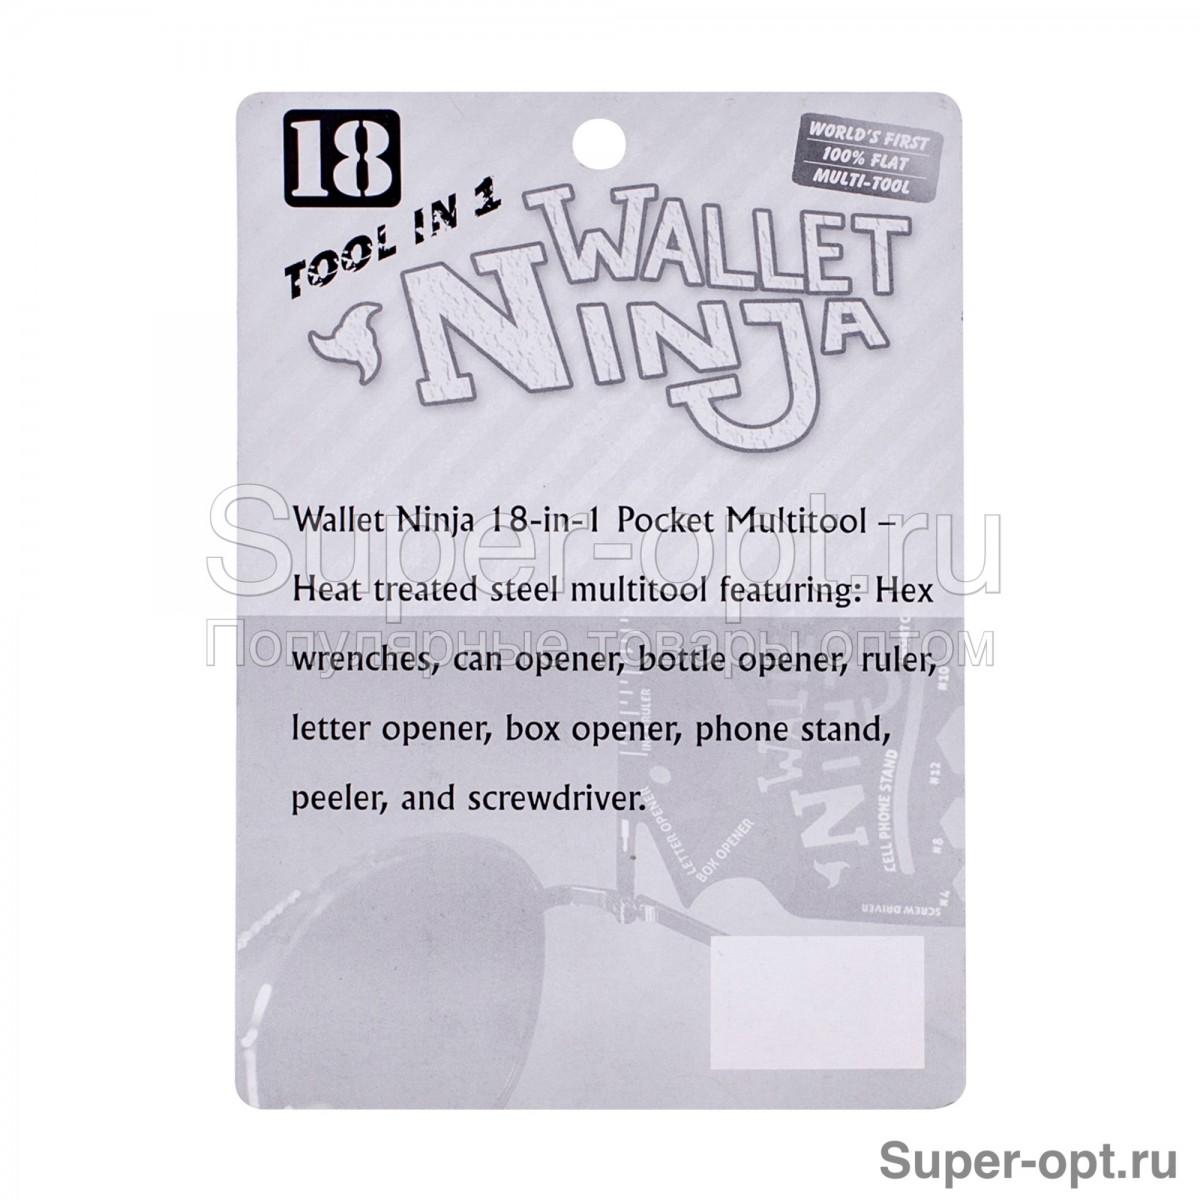 Мультитул Wallet Ninja оптом